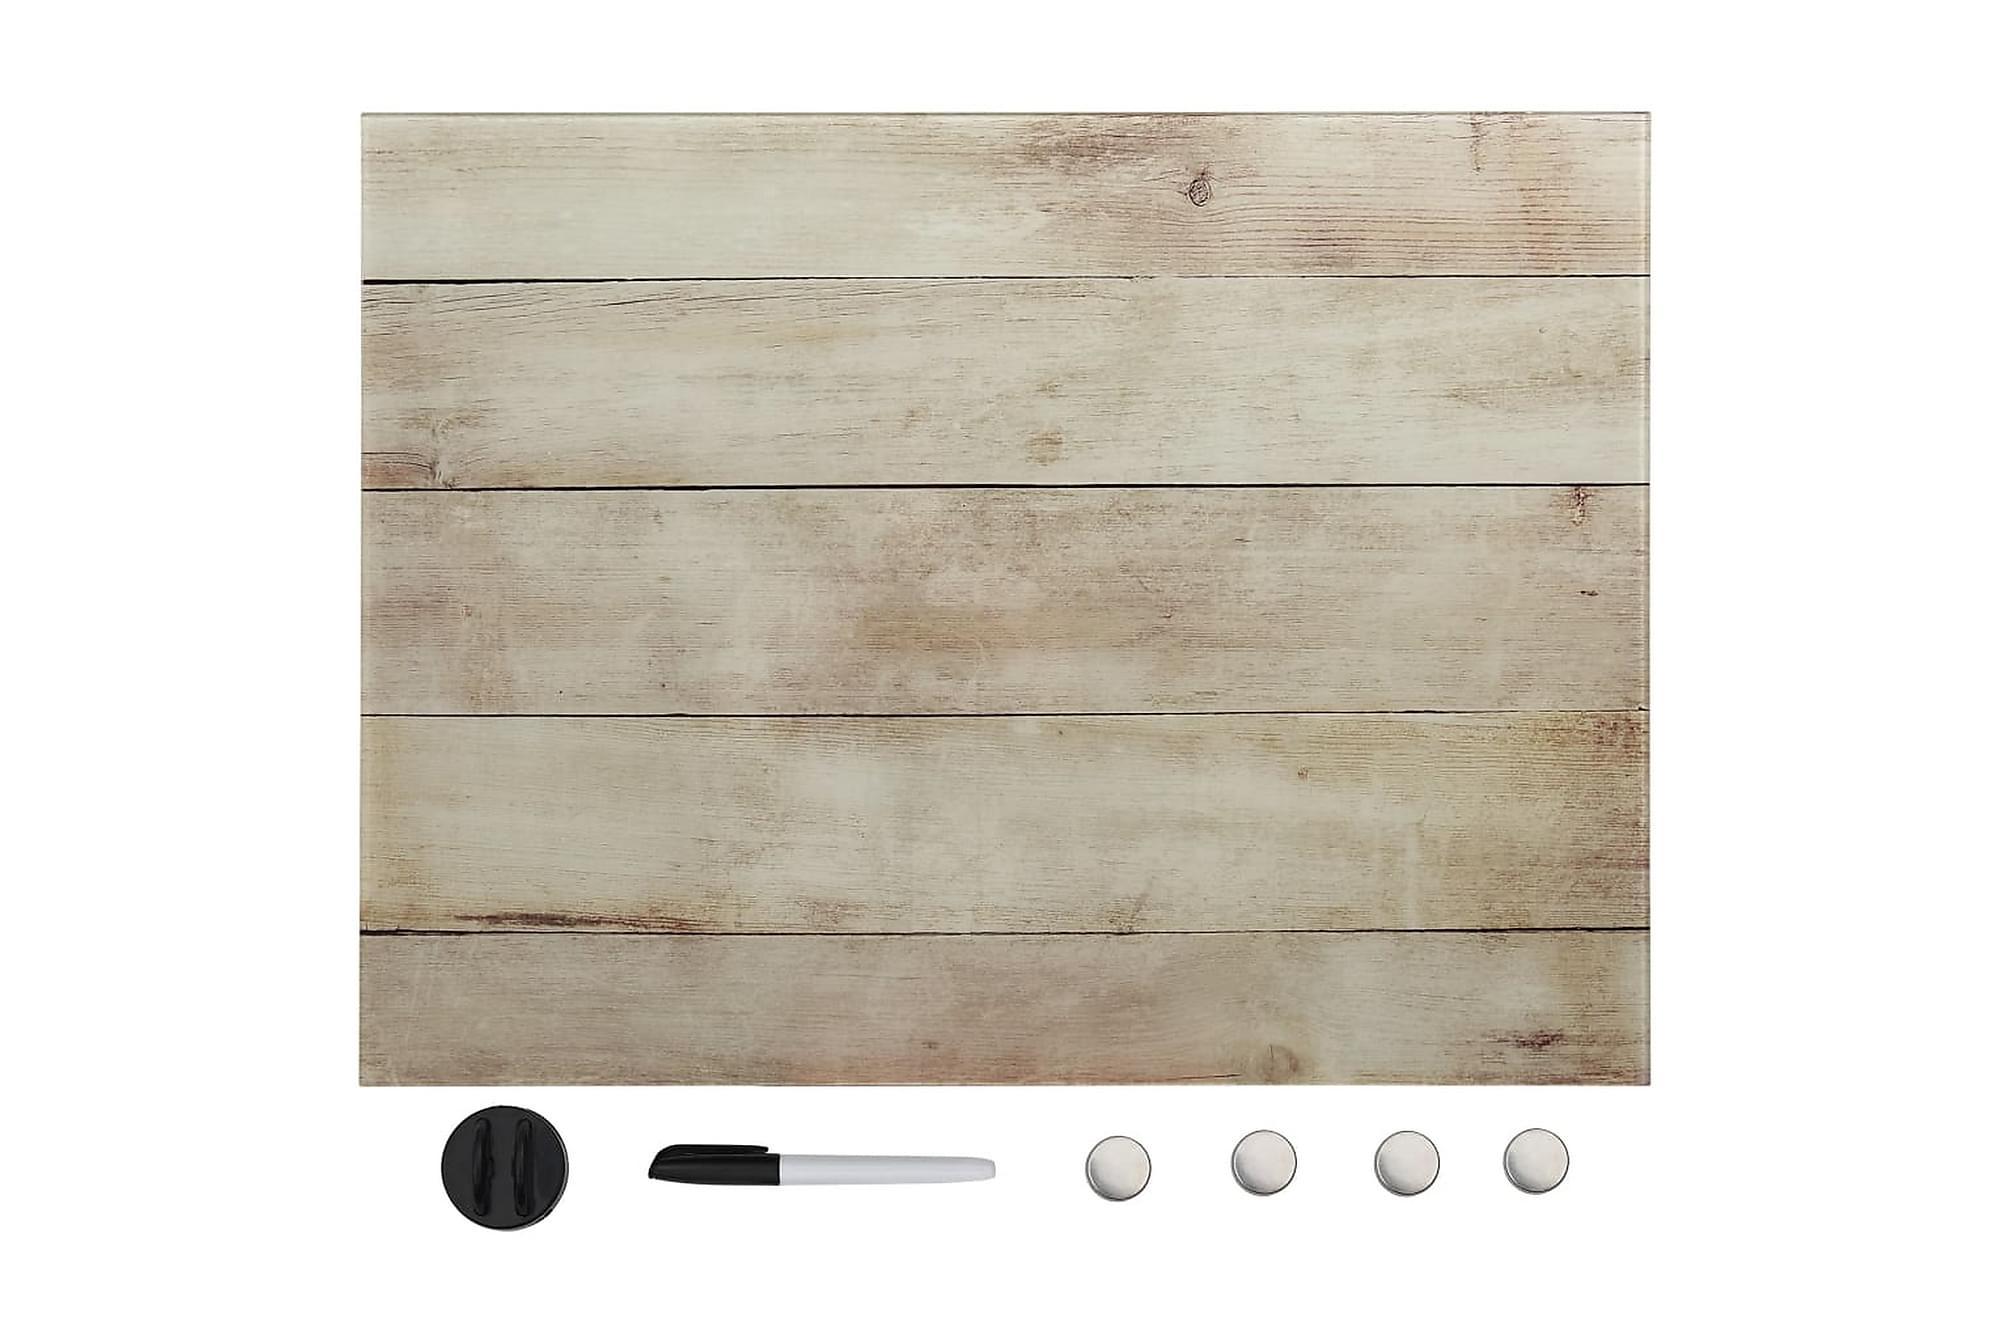 Magnetisk glastavla väggmonterad 60x80 cm, Whiteboards & griffeltavlor